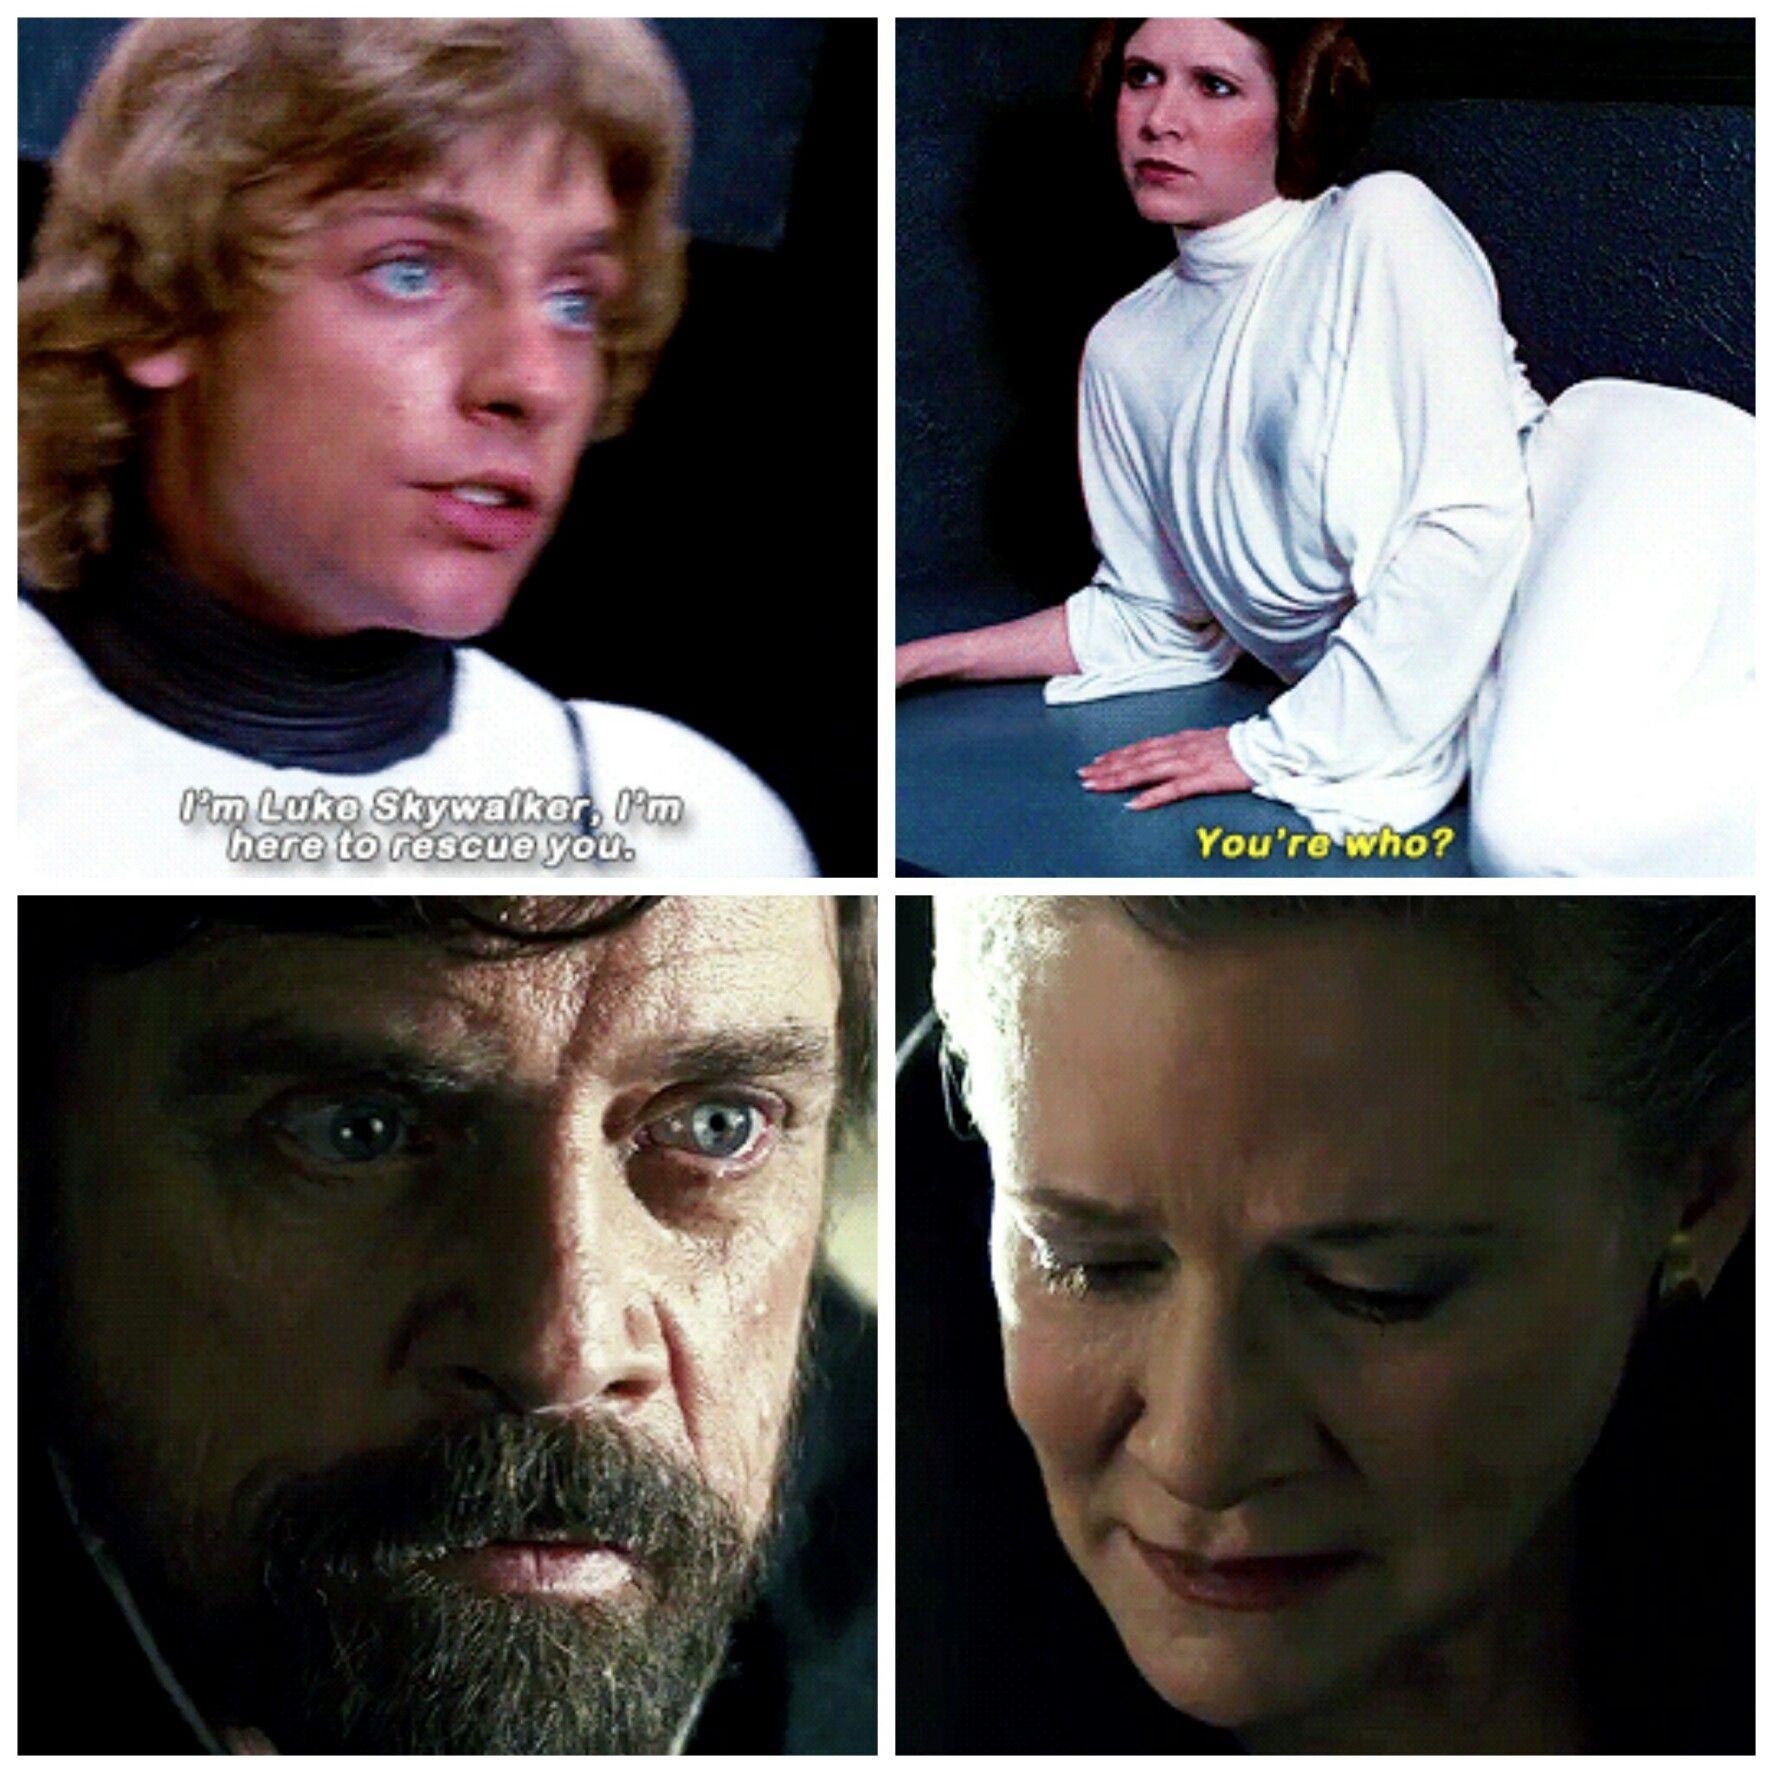 A New Hope The Last Jedi The Skywalker Twins Star Wars Humor Star Wars Memes Star Wars Universe